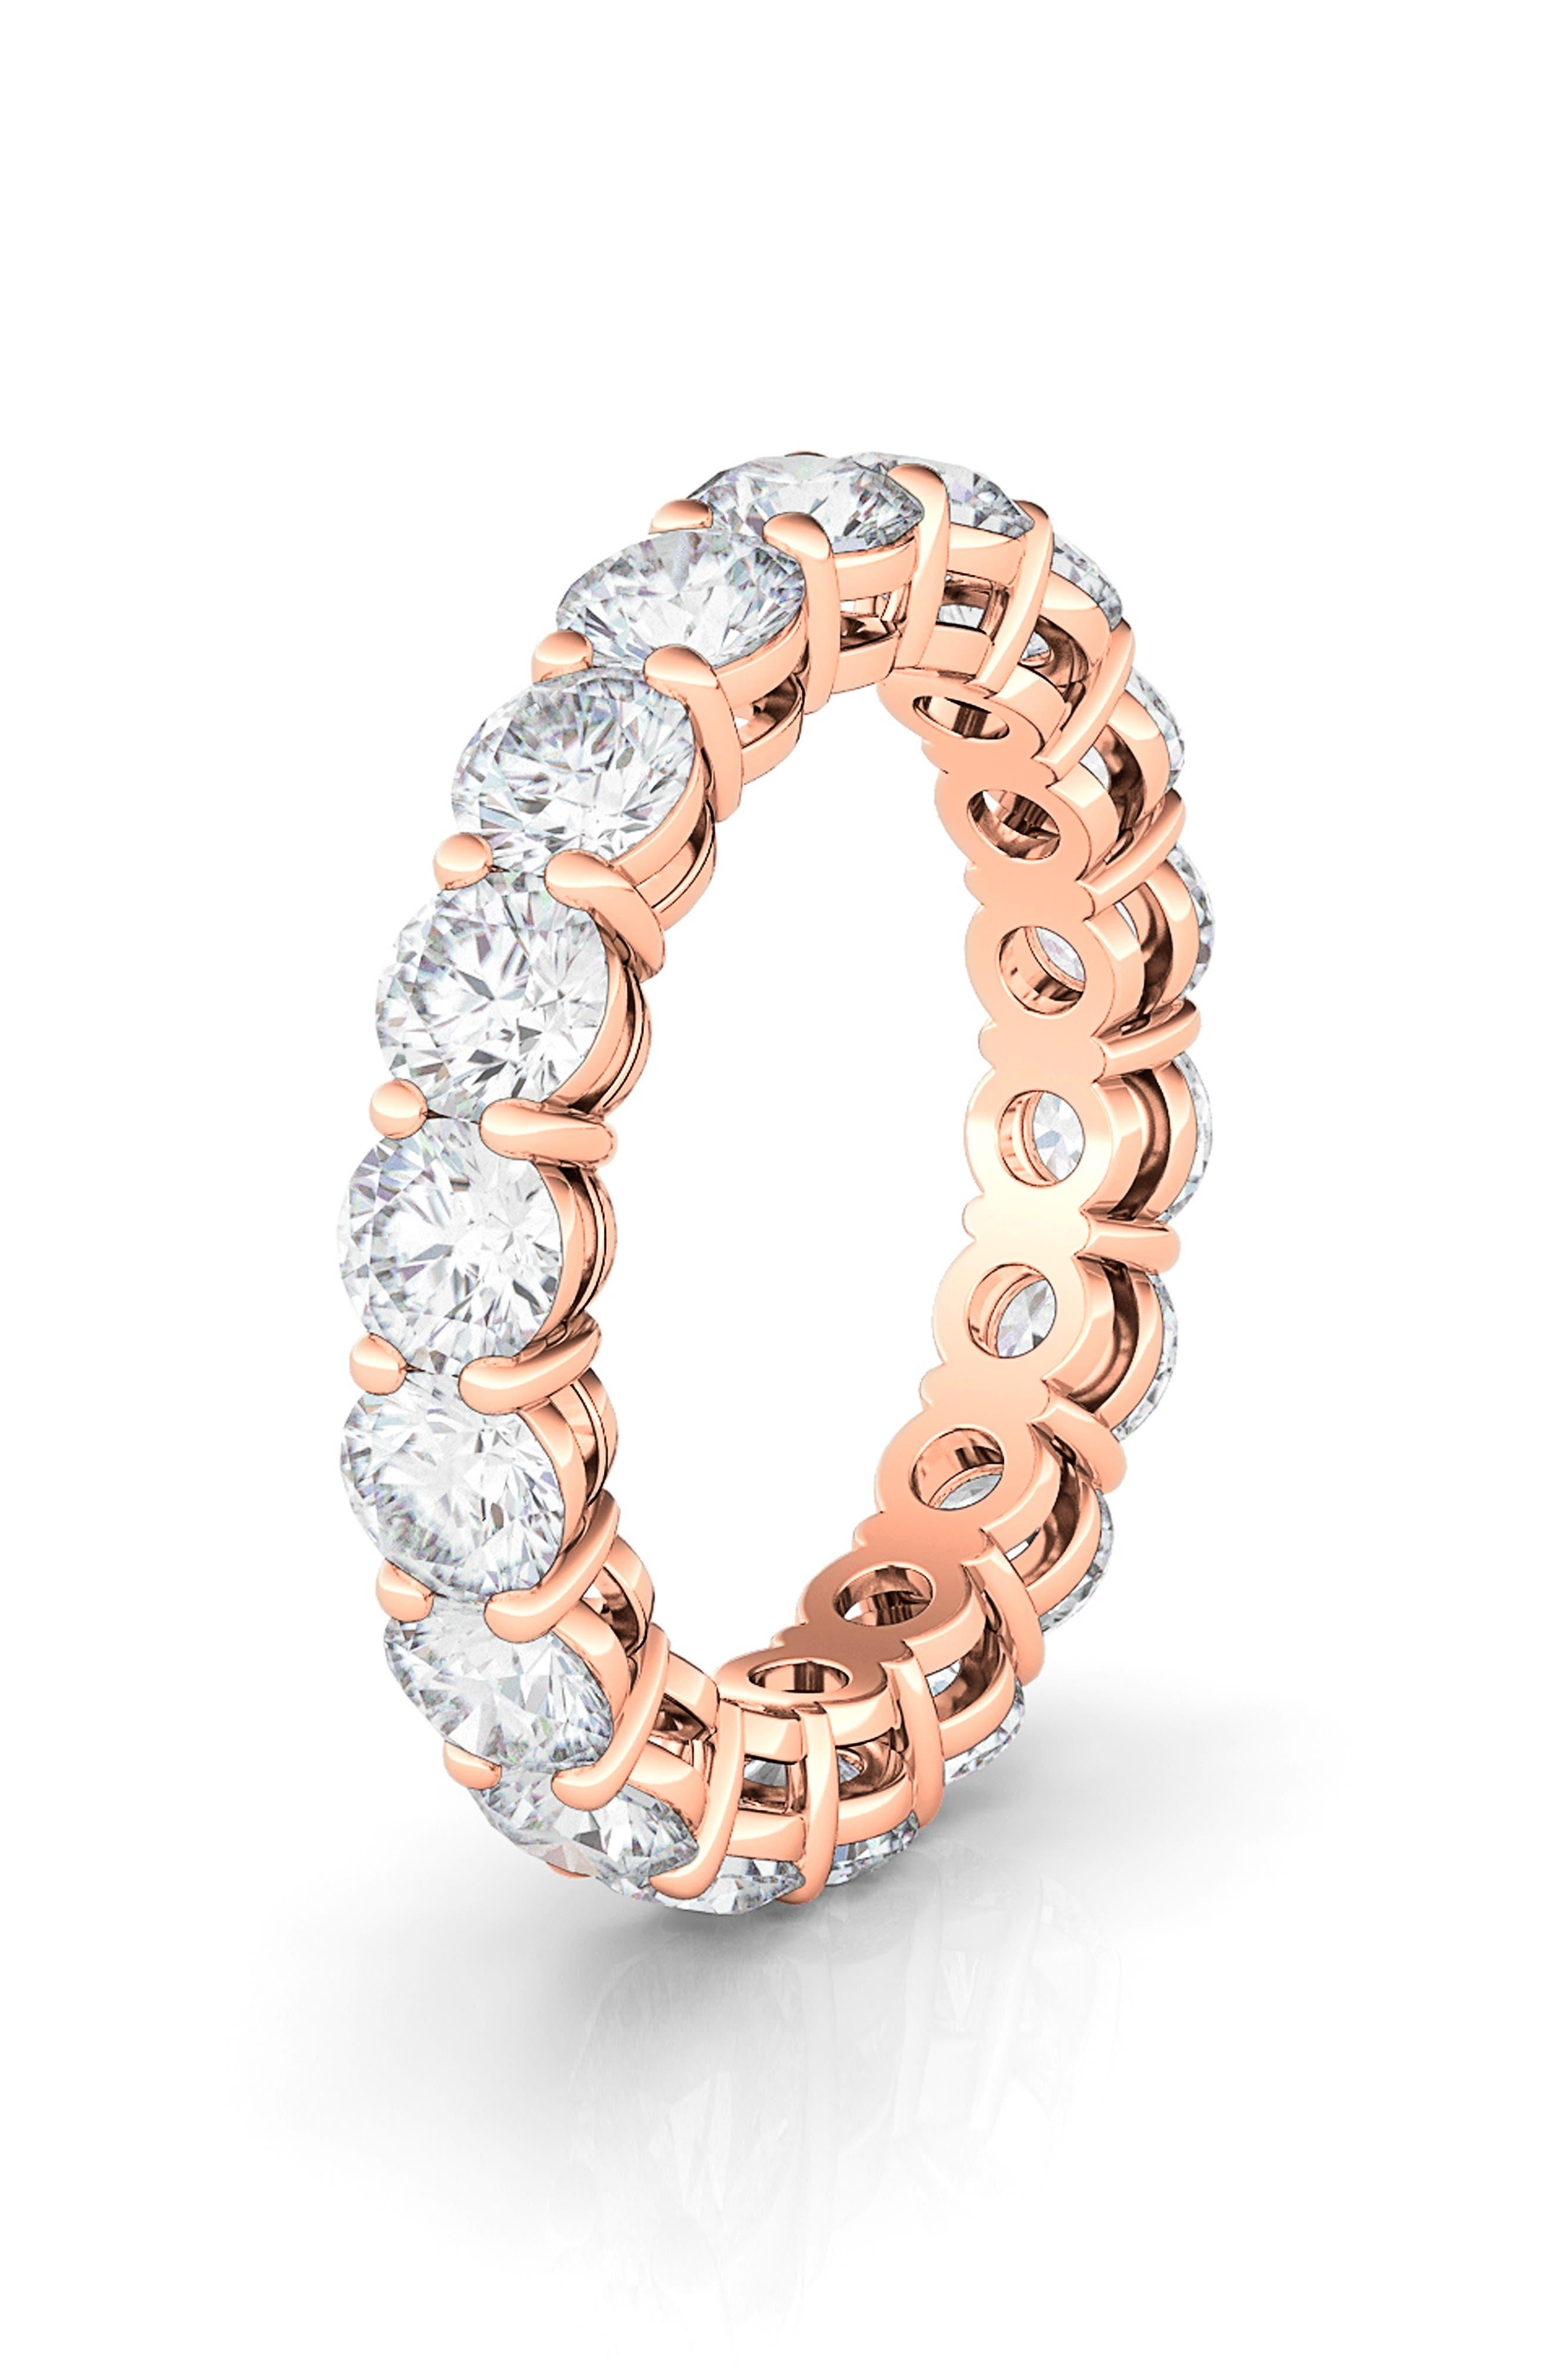 Round Cut 3.75Ct Lab-Created Diamond 18K Gold Eternity Band Ring